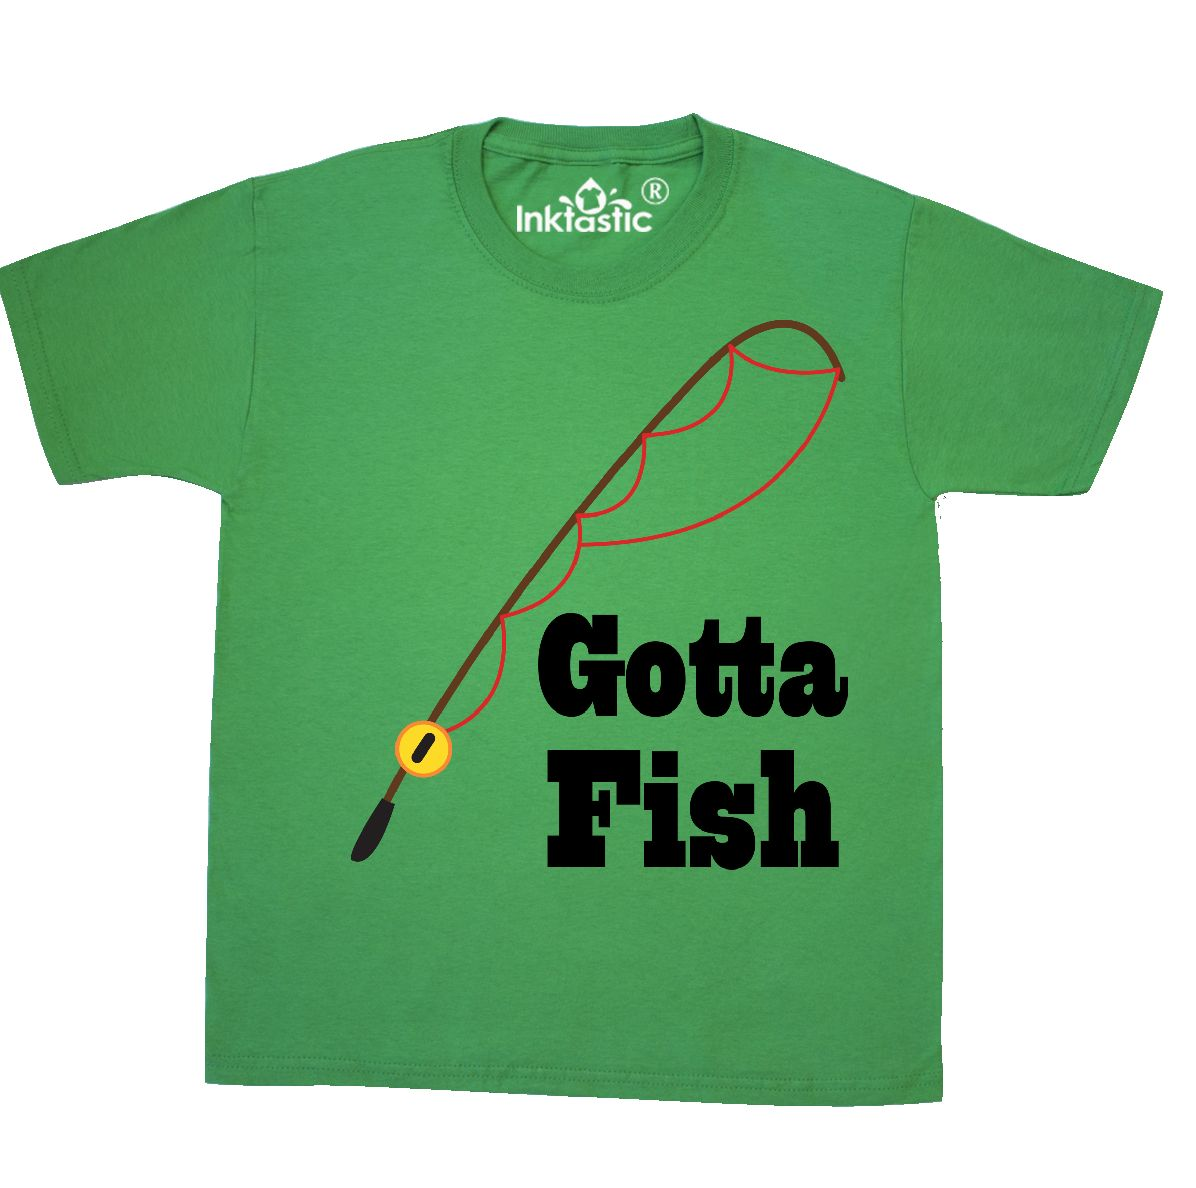 260c8cc0 Inktastic Fishing Gotta Fish Youth T-Shirt Pole Fisherman Sports ...